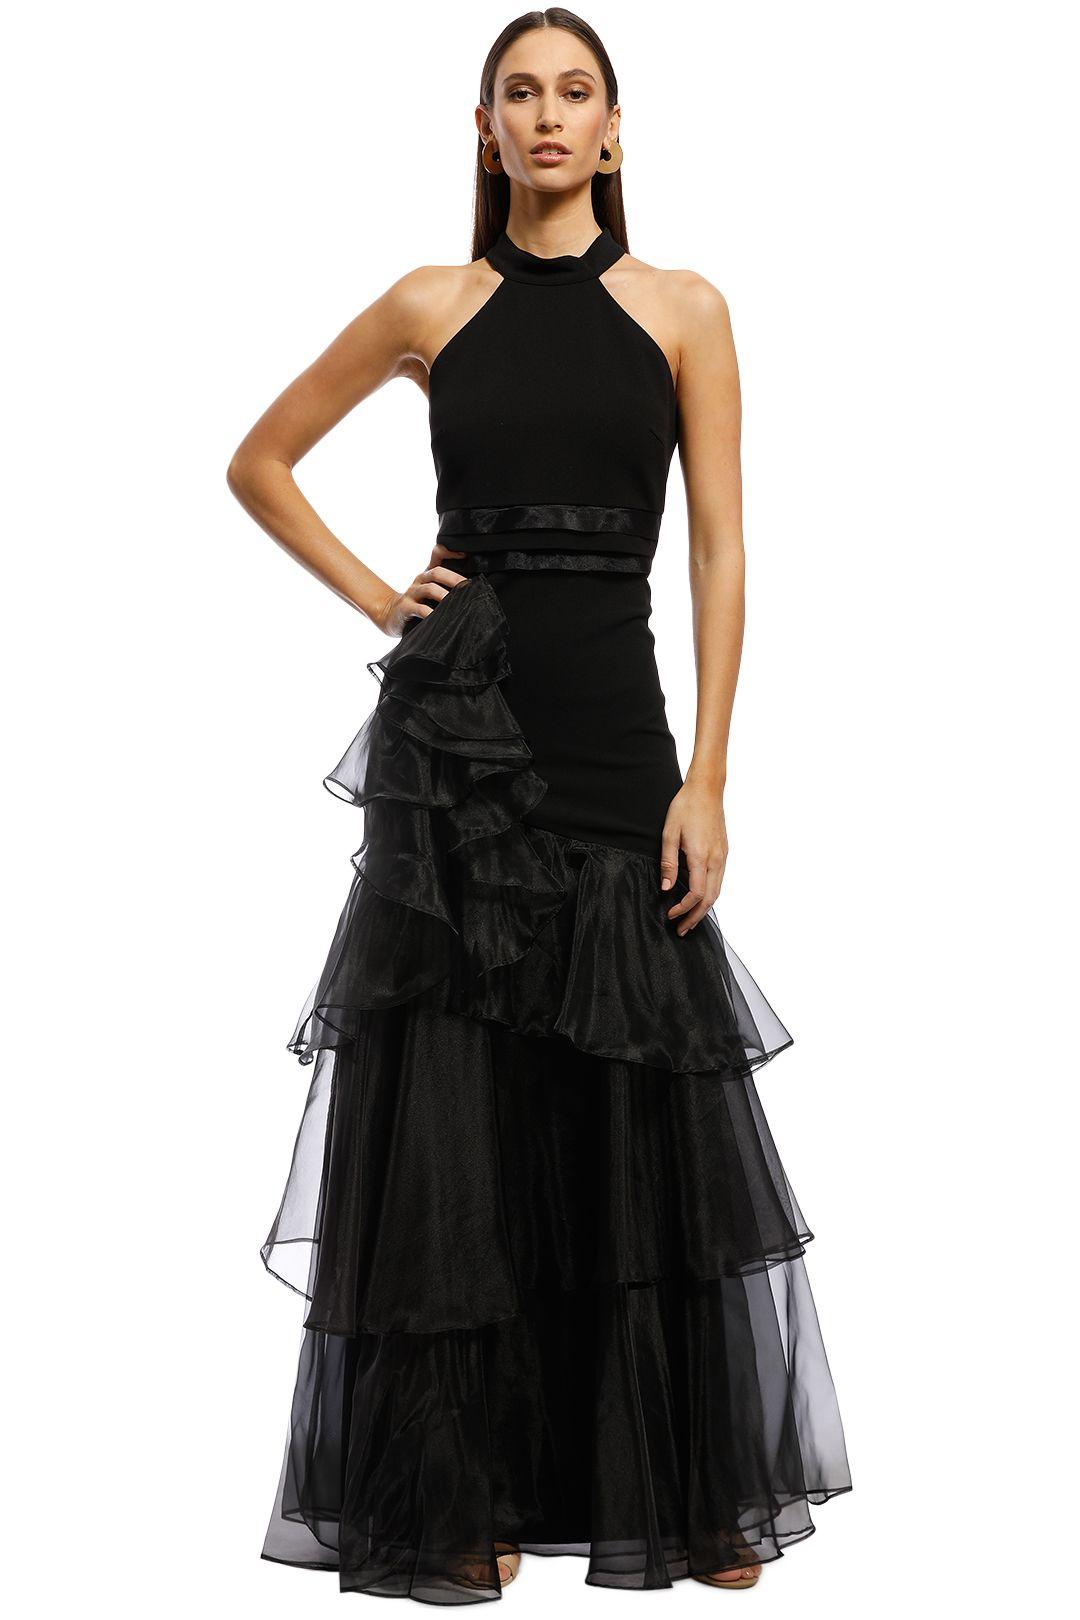 Montique - Caprice Halter Gown - Black - Front